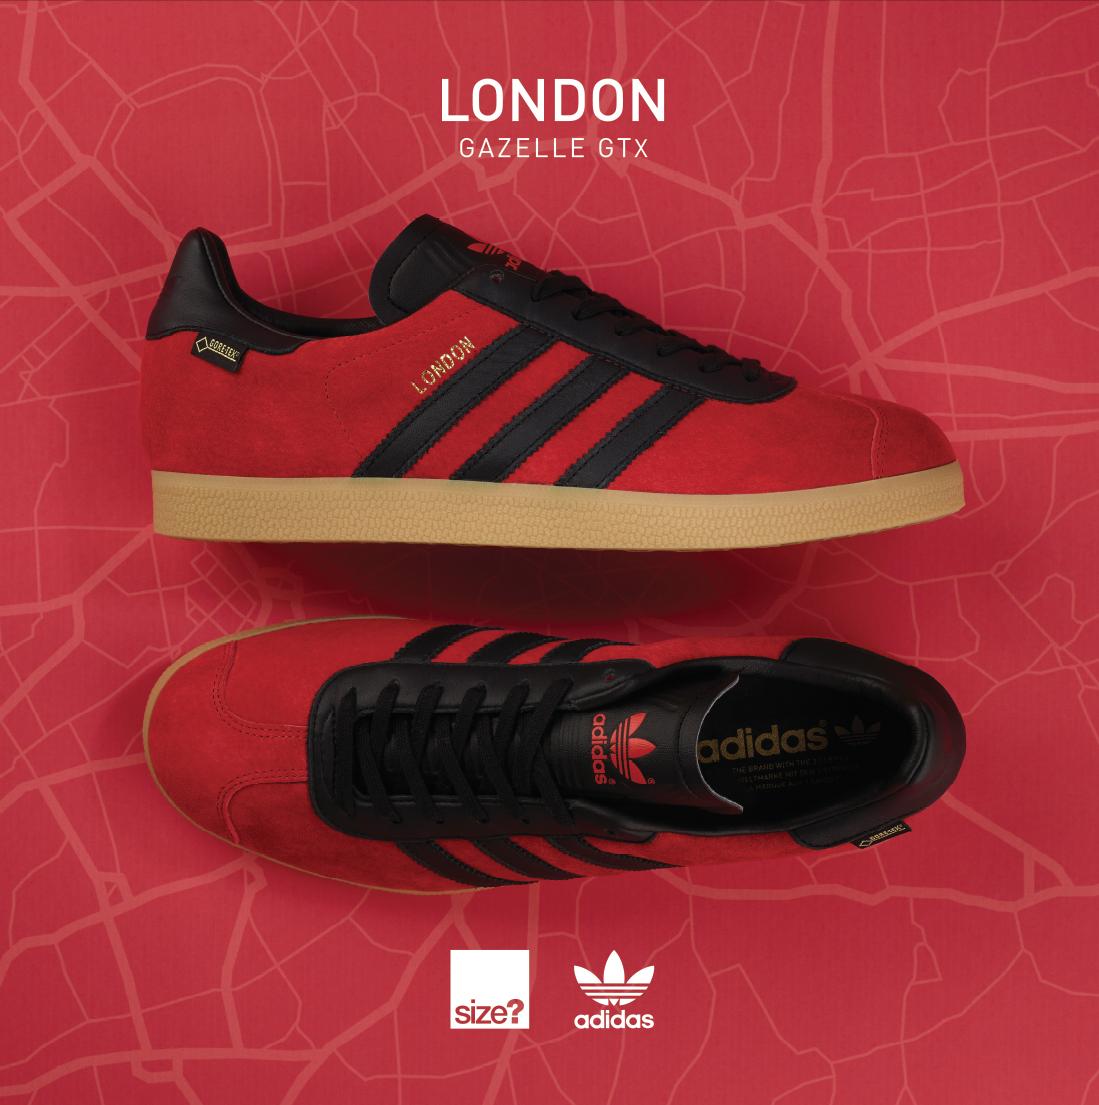 adidas london shoes price